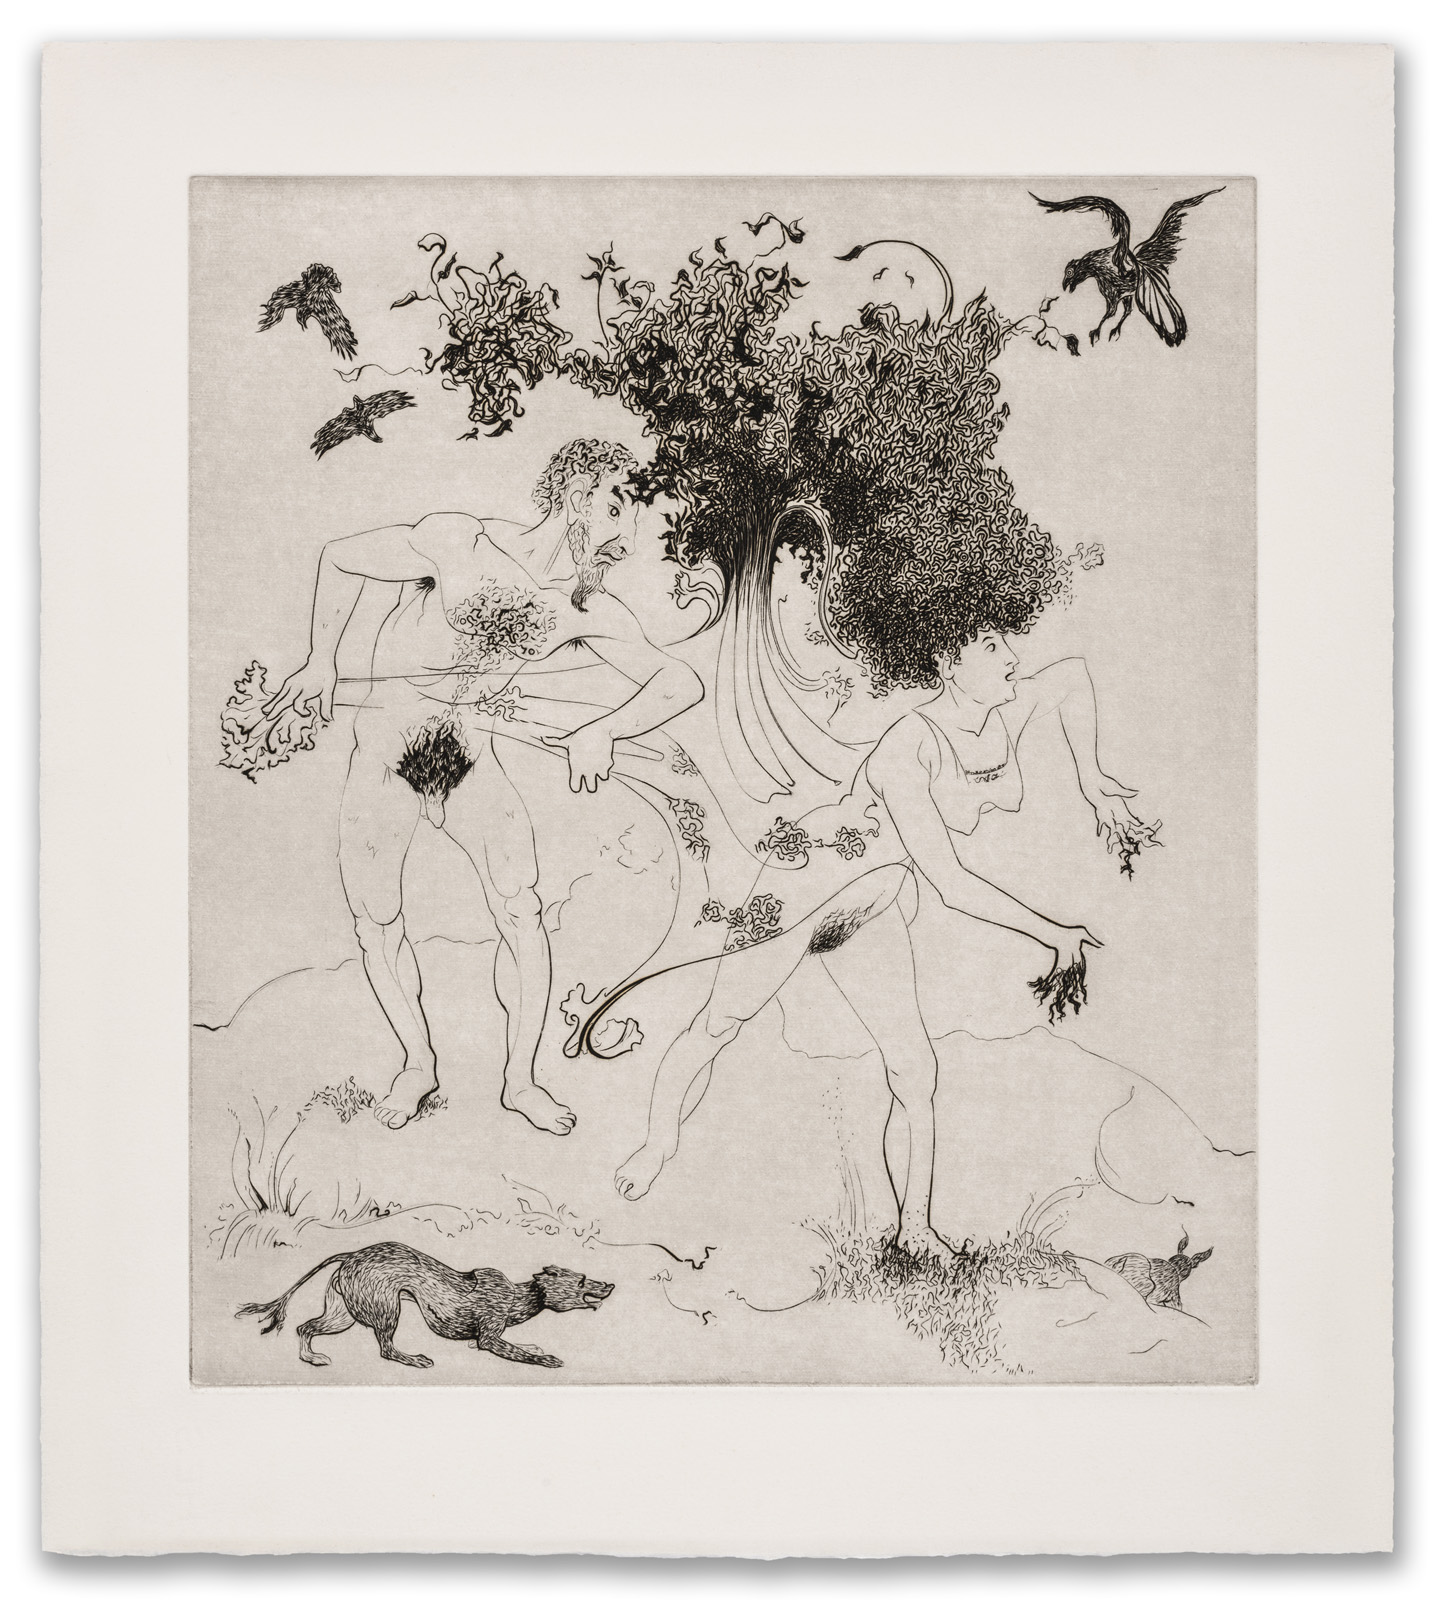 Francis West, (British 1936-2015), Metamorphosis, c.1979 (2017 Edition).